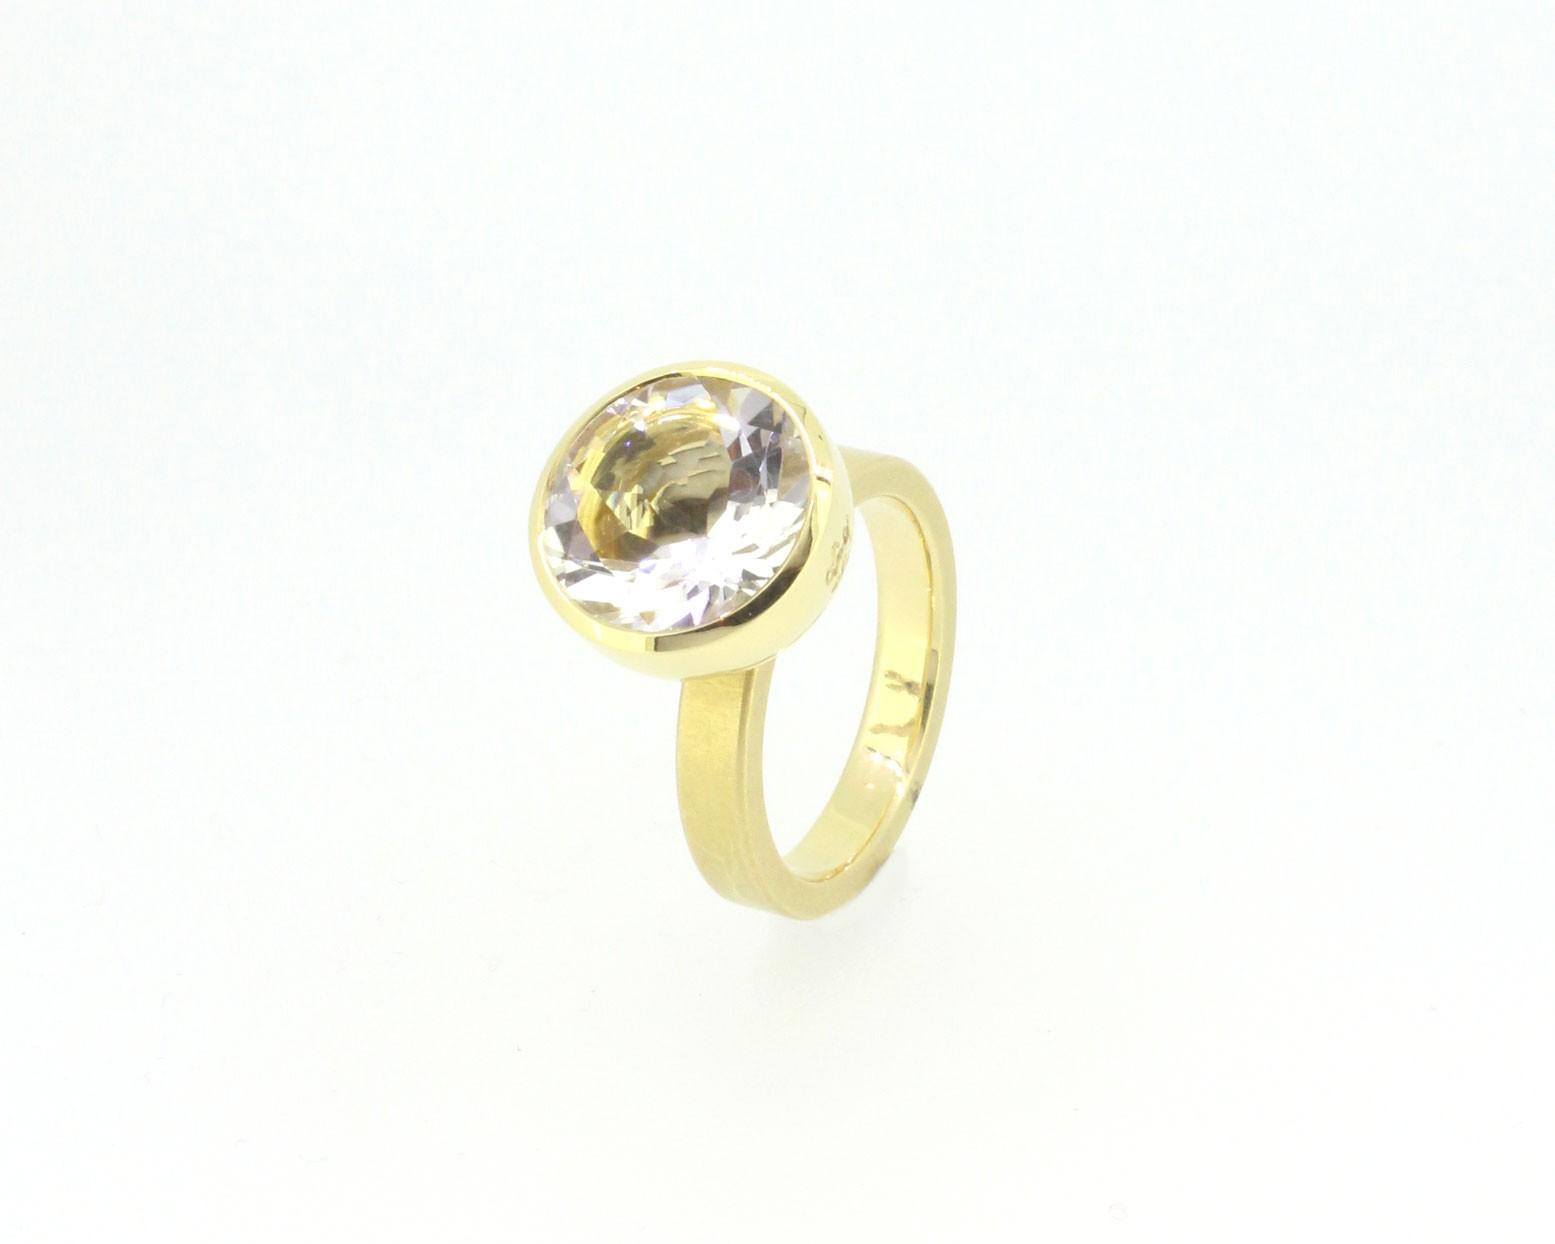 Ring Blub Bergkristall - Georg Spreng - 413spre08-2